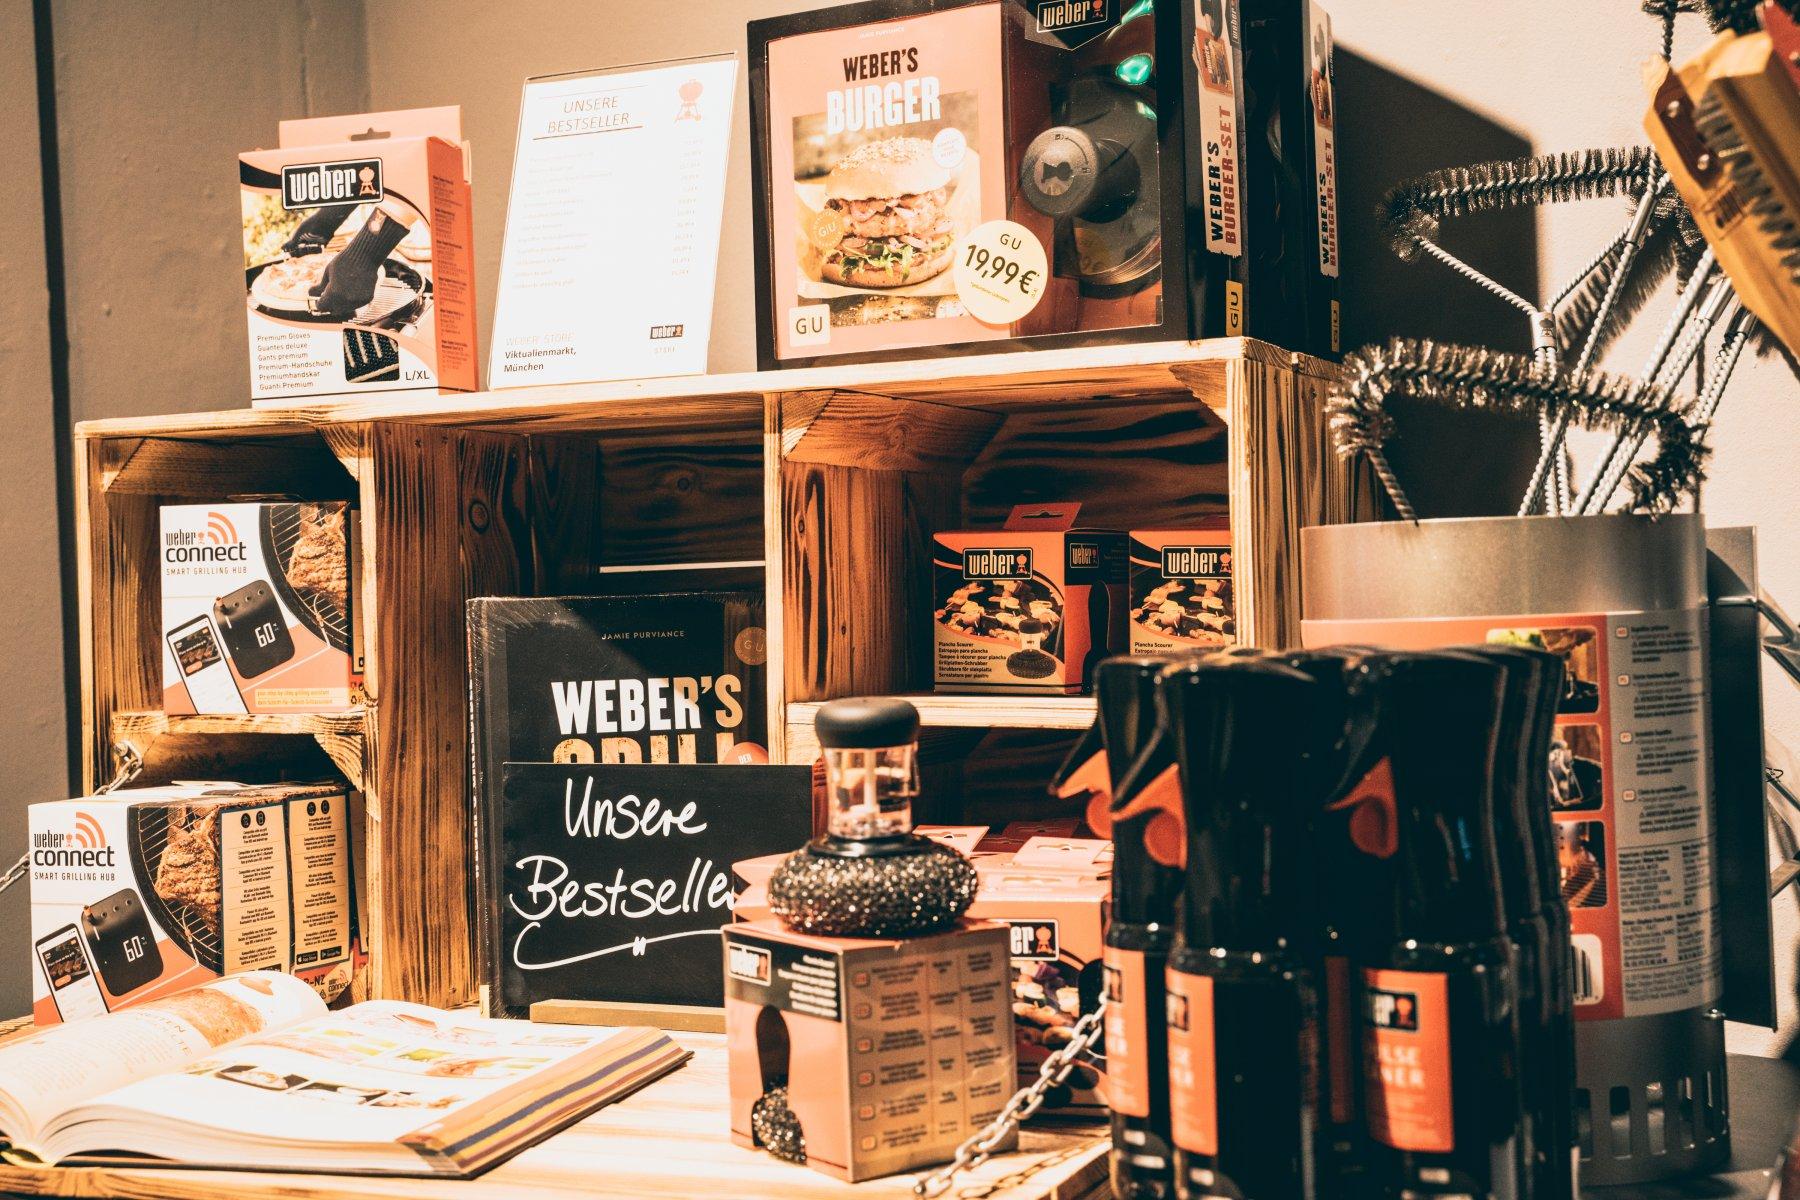 geheimtipp muenchen weber store grill09145 – ©wunderland media GmbH